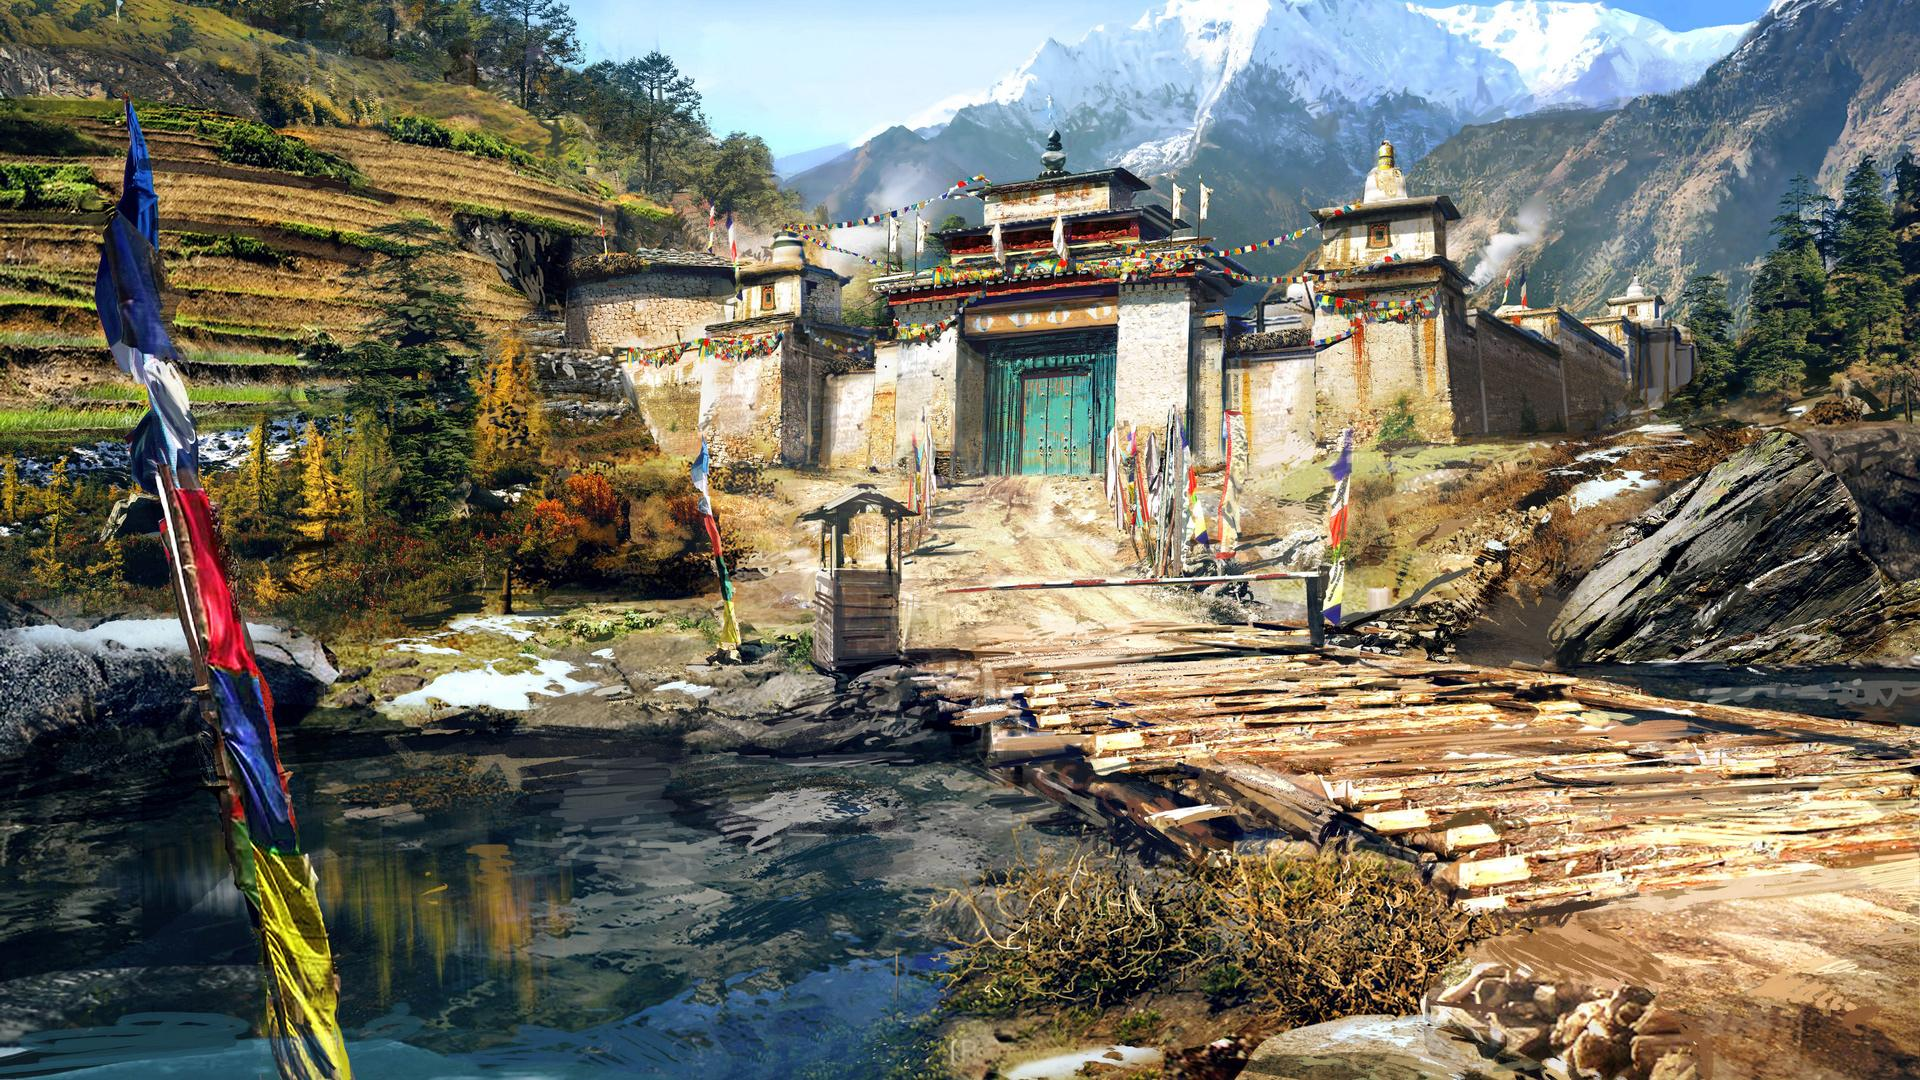 Far Cry 4 Wallpaper: Far Cry 4 Wallpaper HD Download